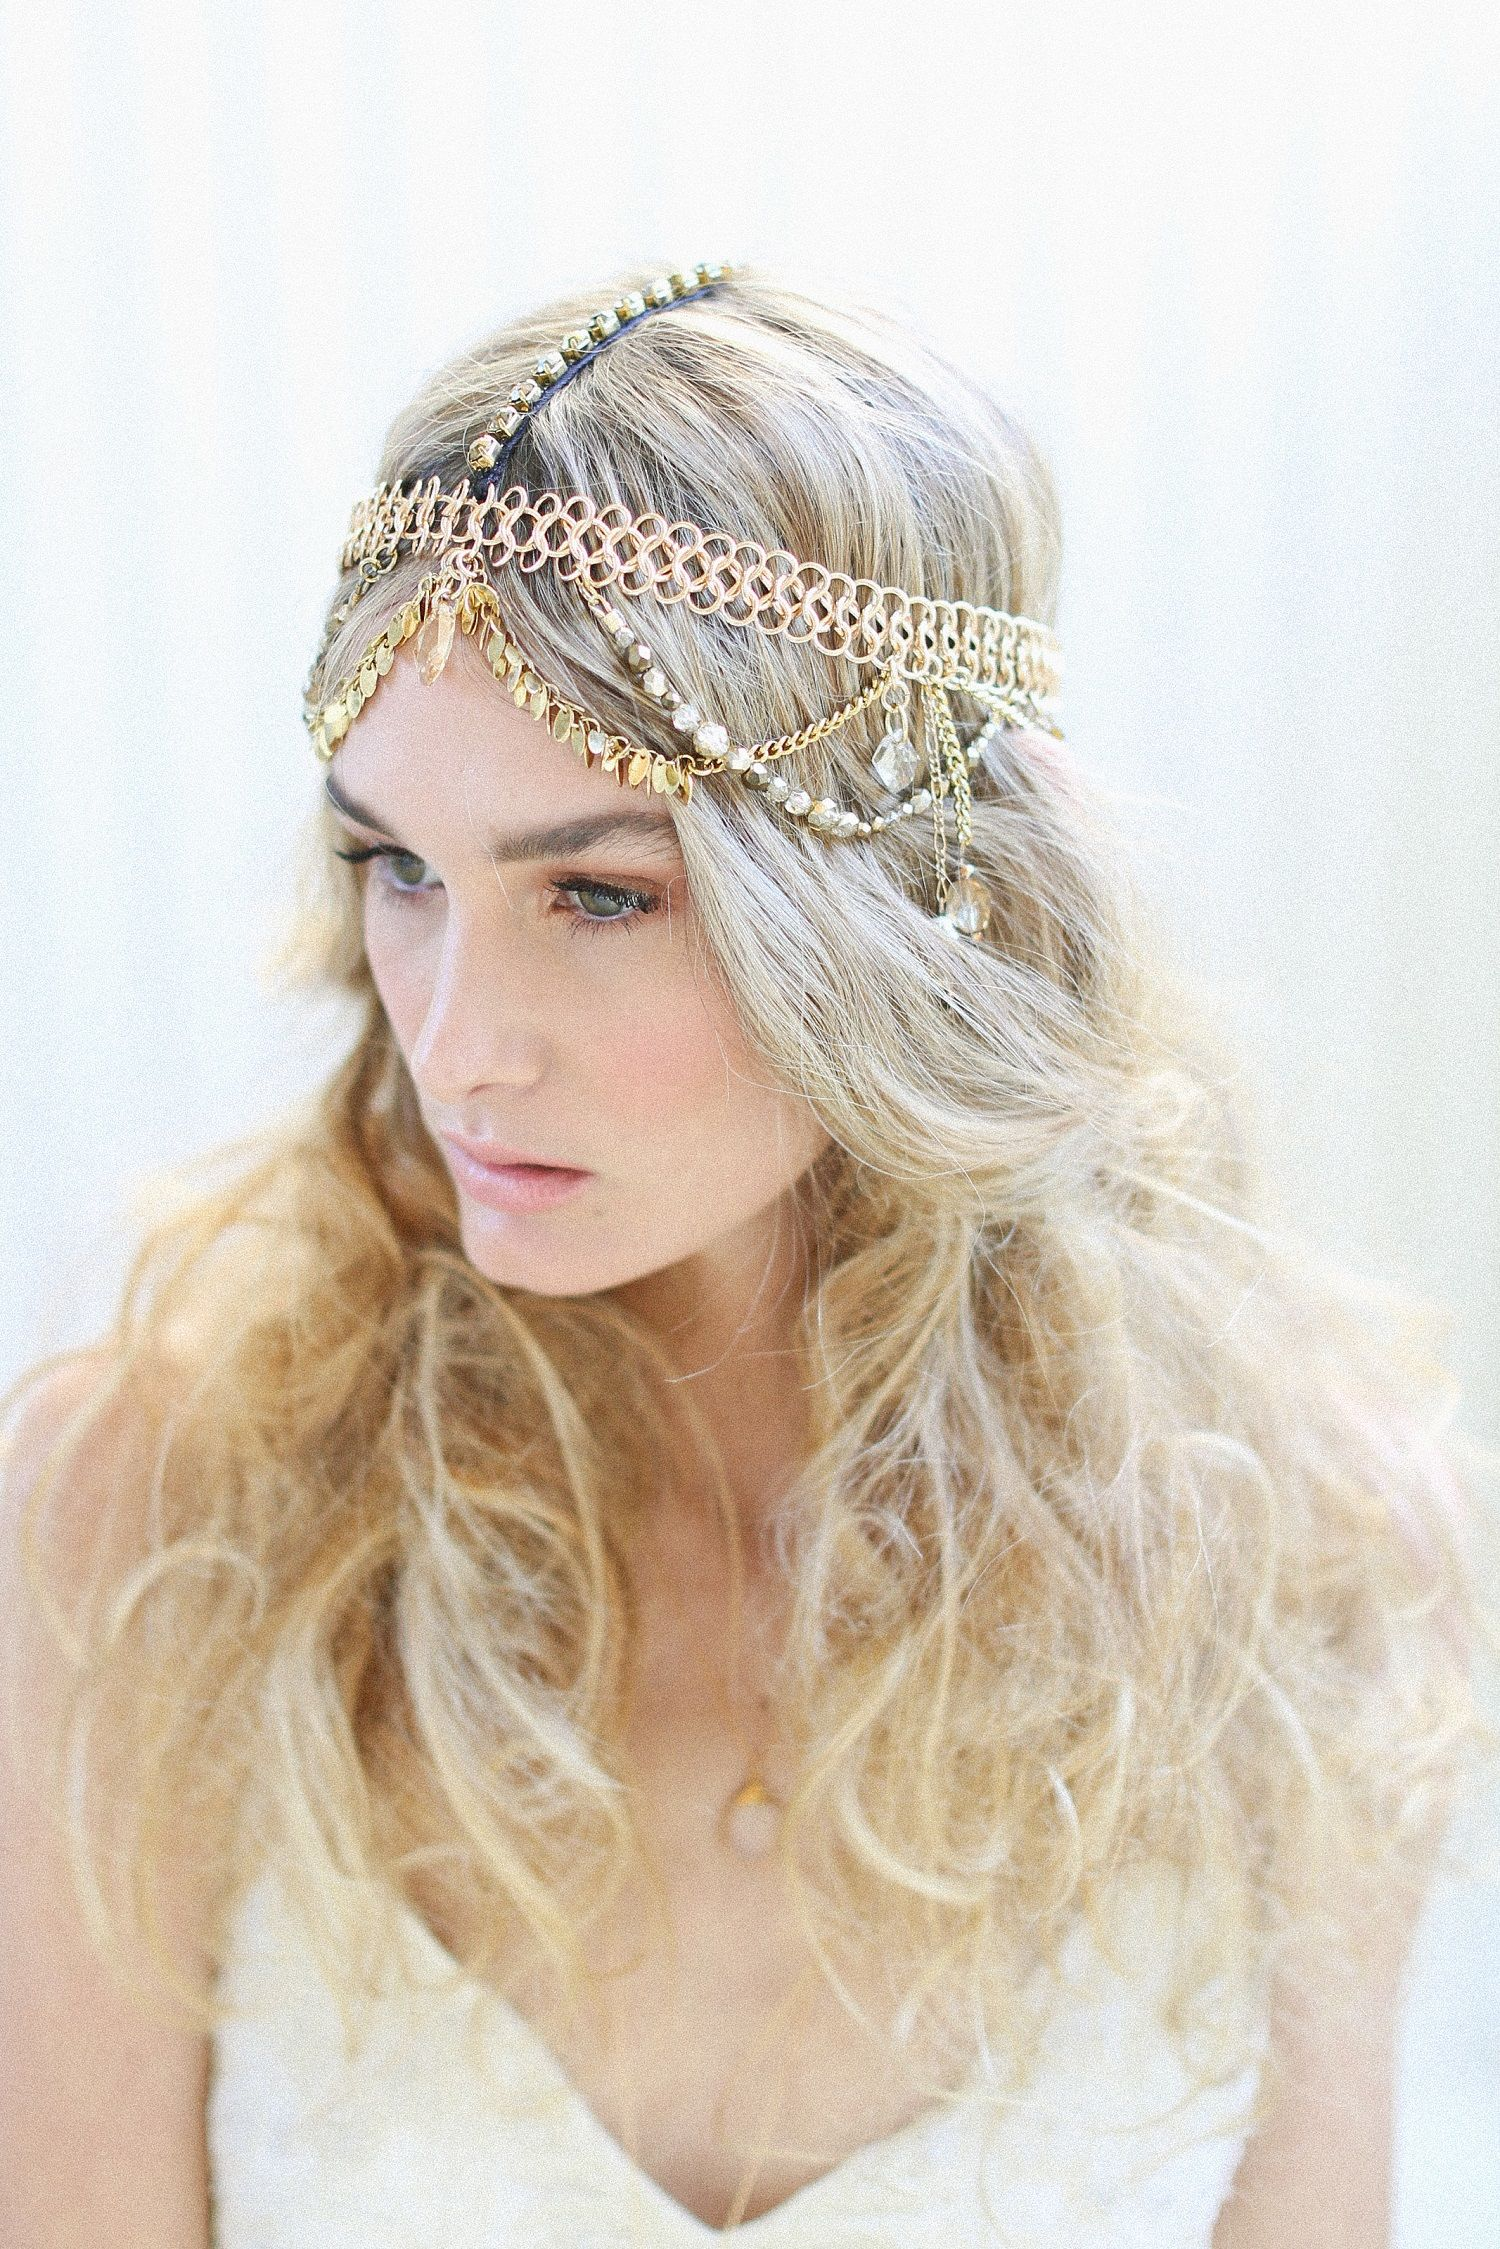 Embellished headpiece 1